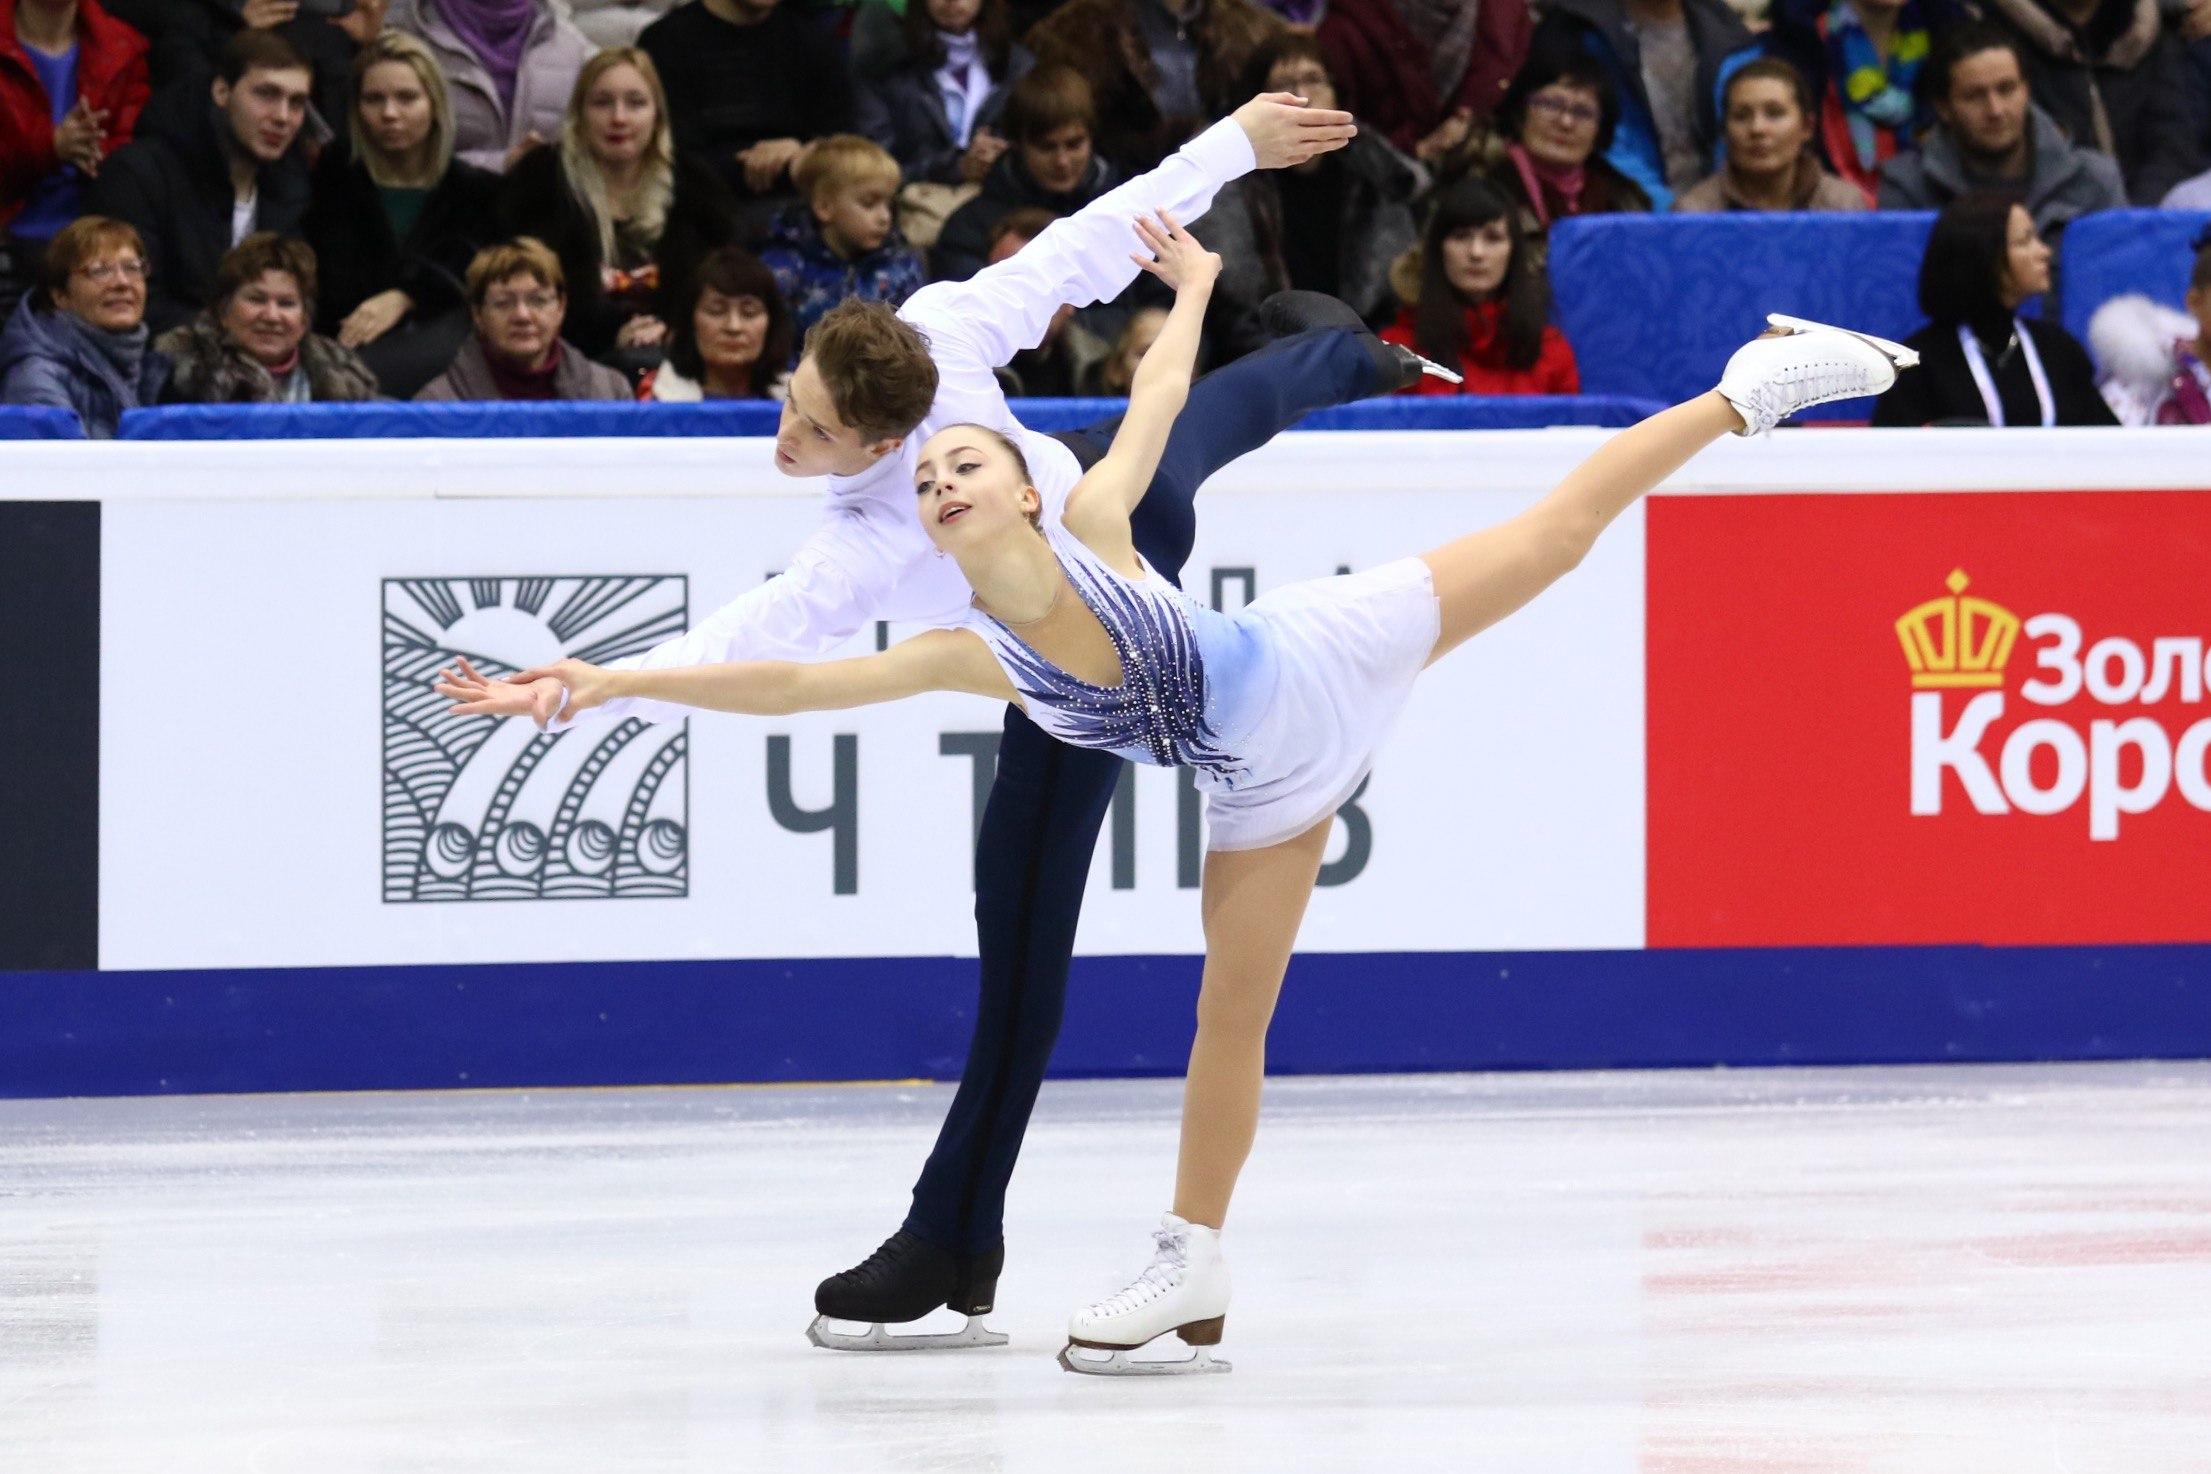 Александра Бойкова и Дмитрий Козловский (26.12.2016)